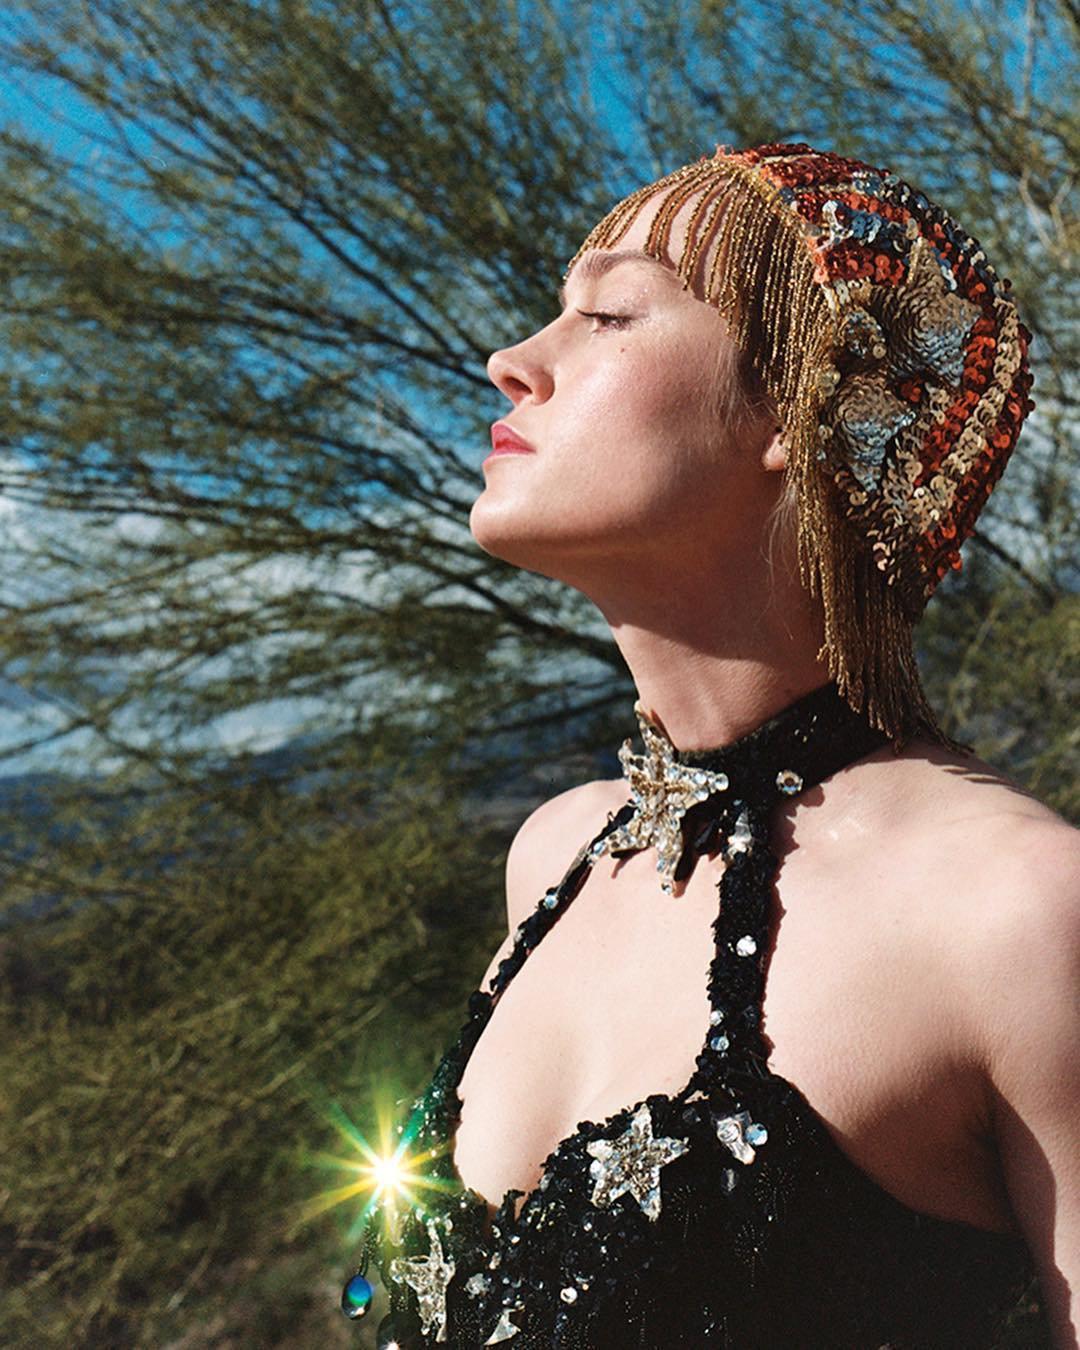 Brie Larson Sexy Photoshoot